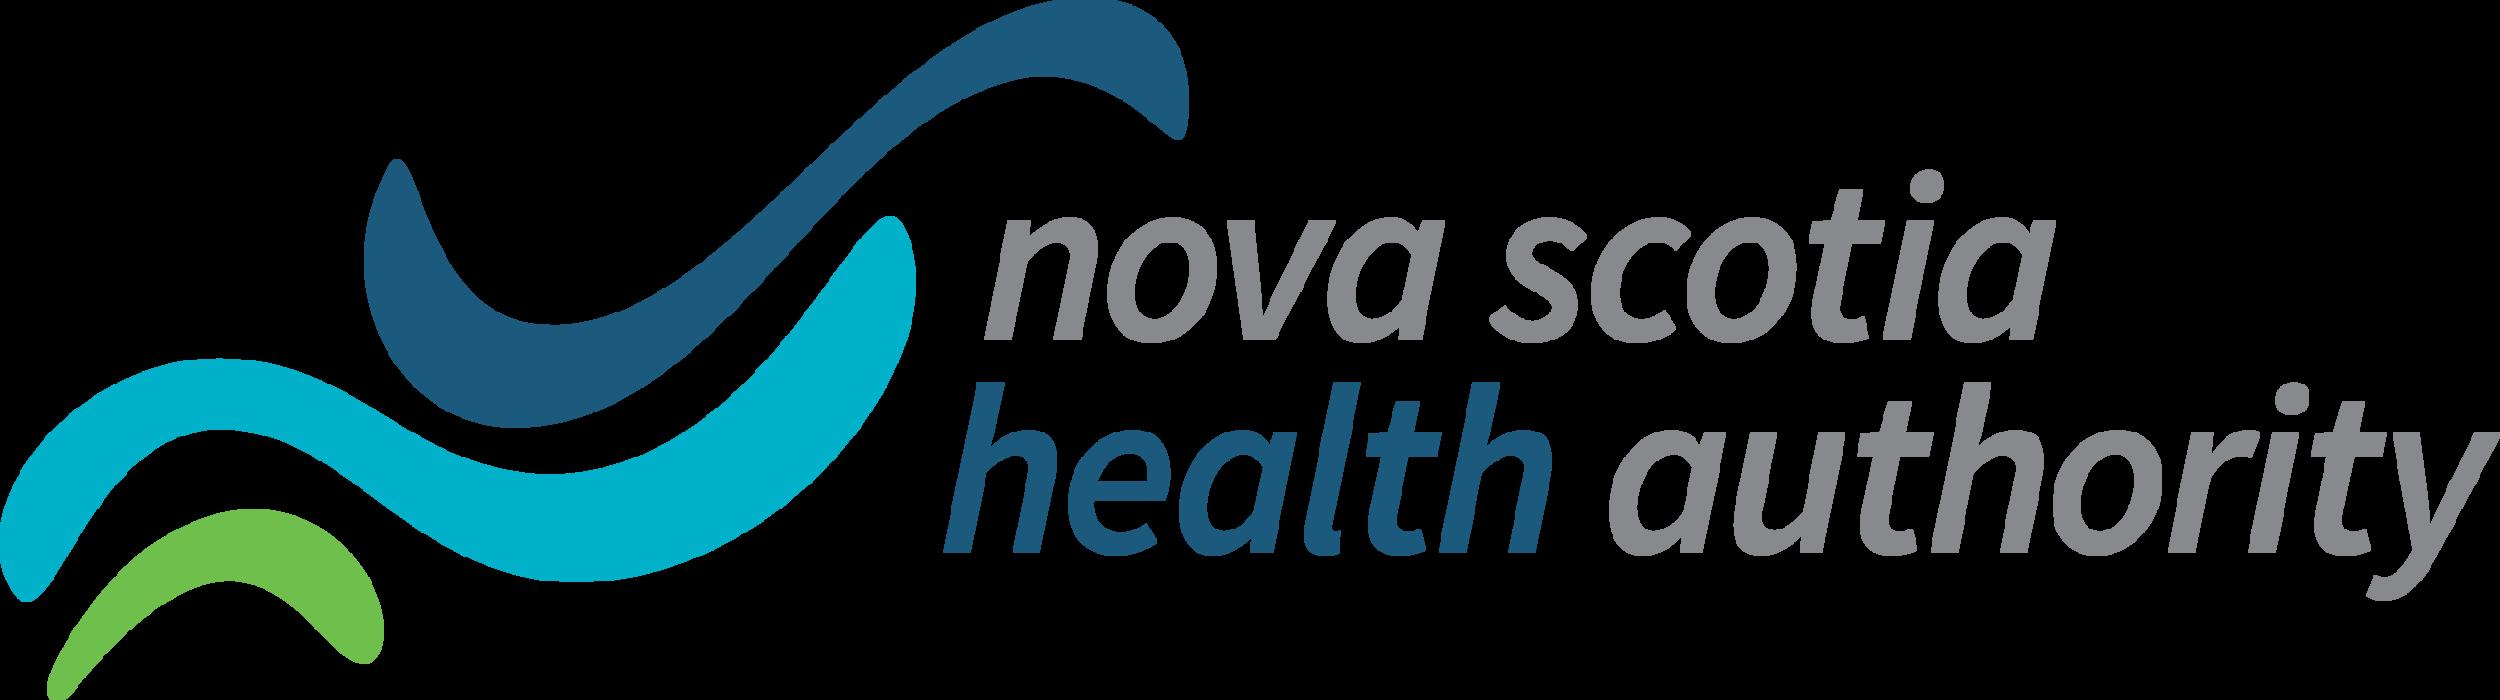 NSHA-logo-col.png